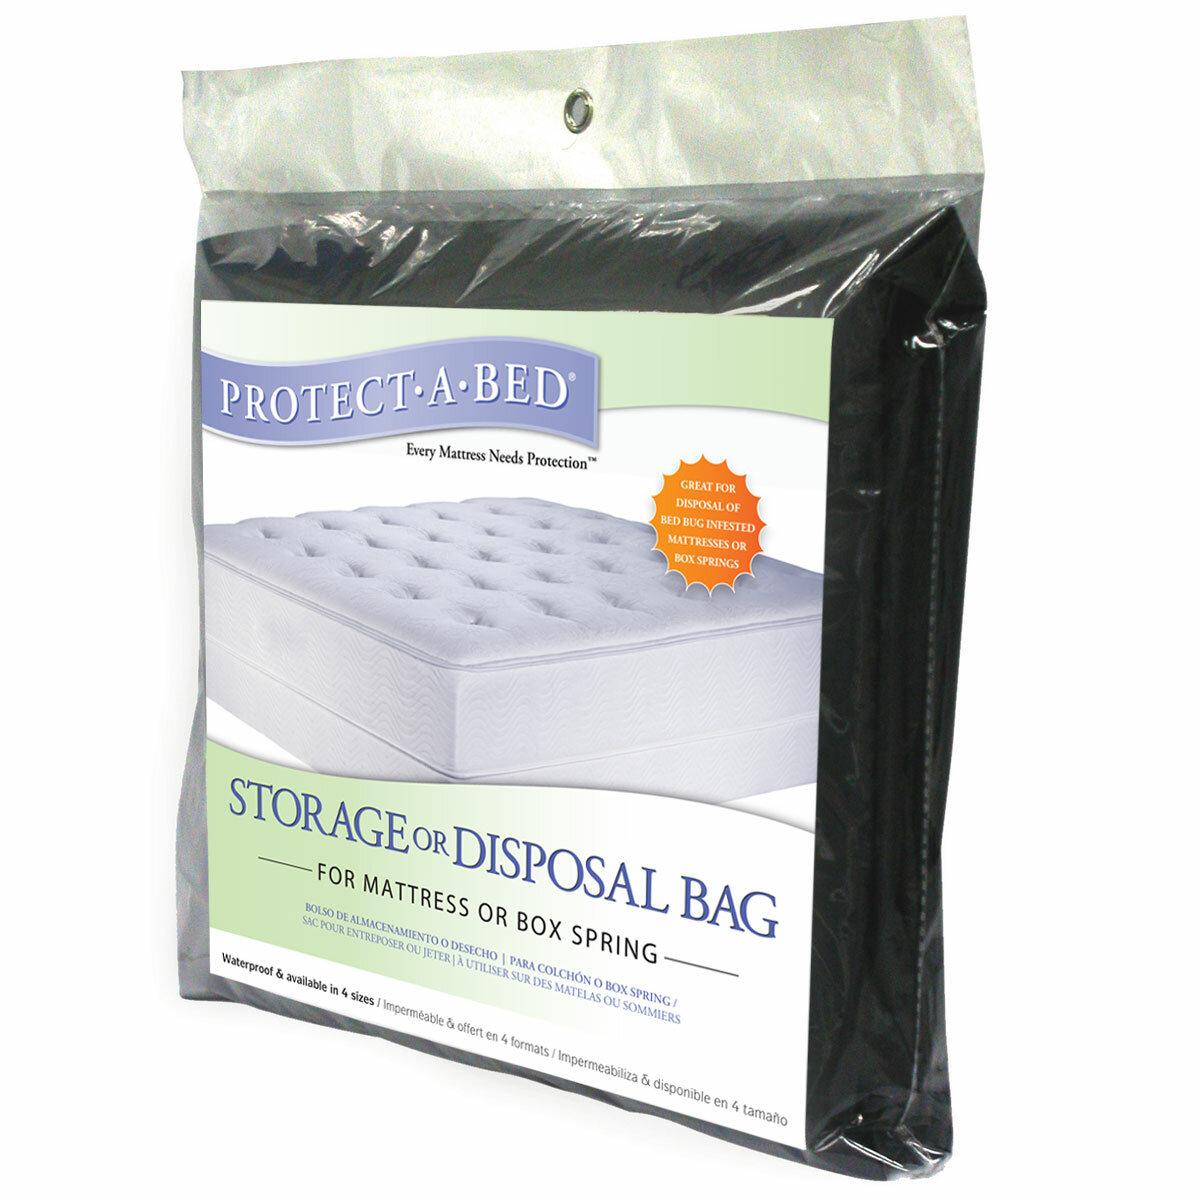 Ordinaire Protect A Bed Storage Disposal Waterproof Mattress Protector U0026 Reviews |  Wayfair